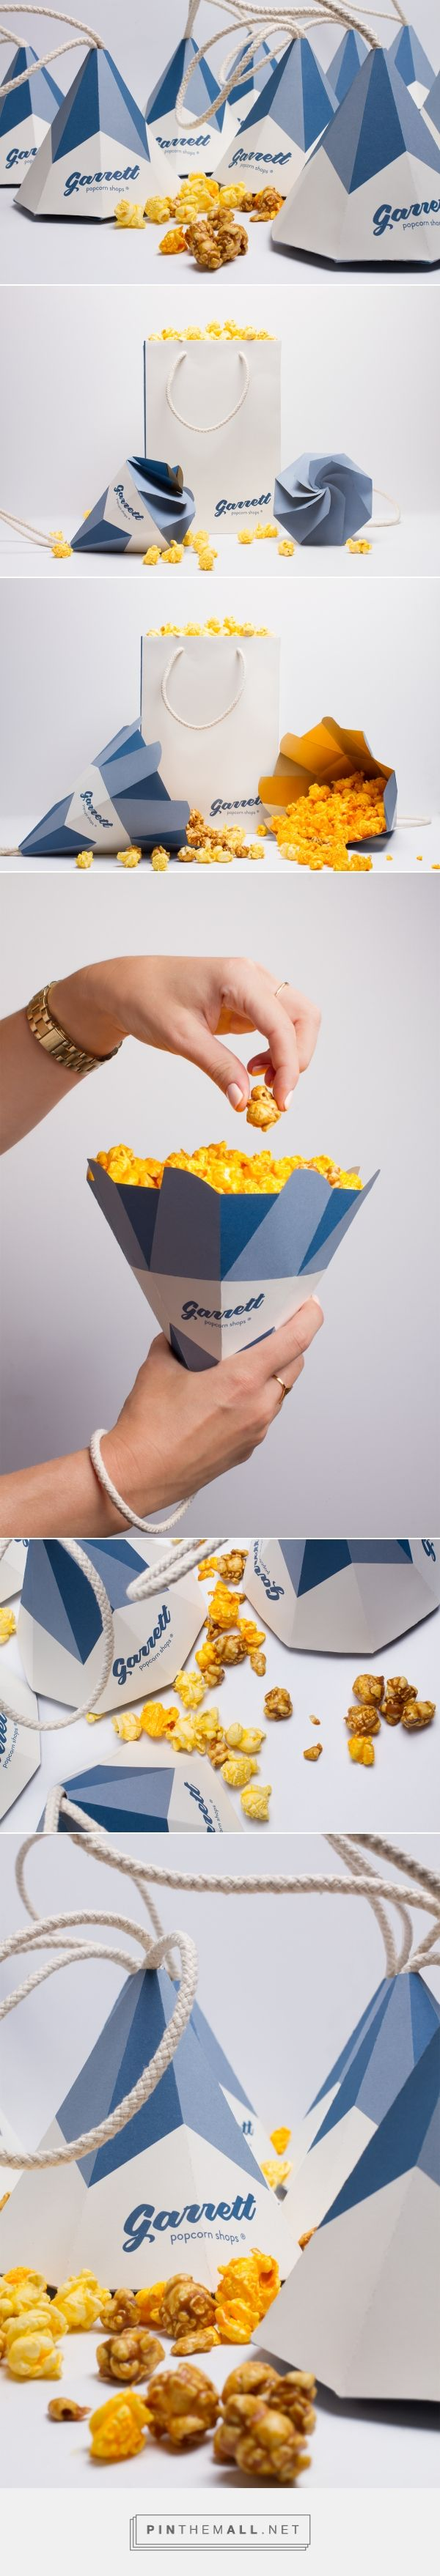 Garrett Popcorn Shops Cones packaging design concept by Jennifer Mulvihill - http://www.packagingoftheworld.com/2017/01/garrett-popcorn-shops-cones-student.html